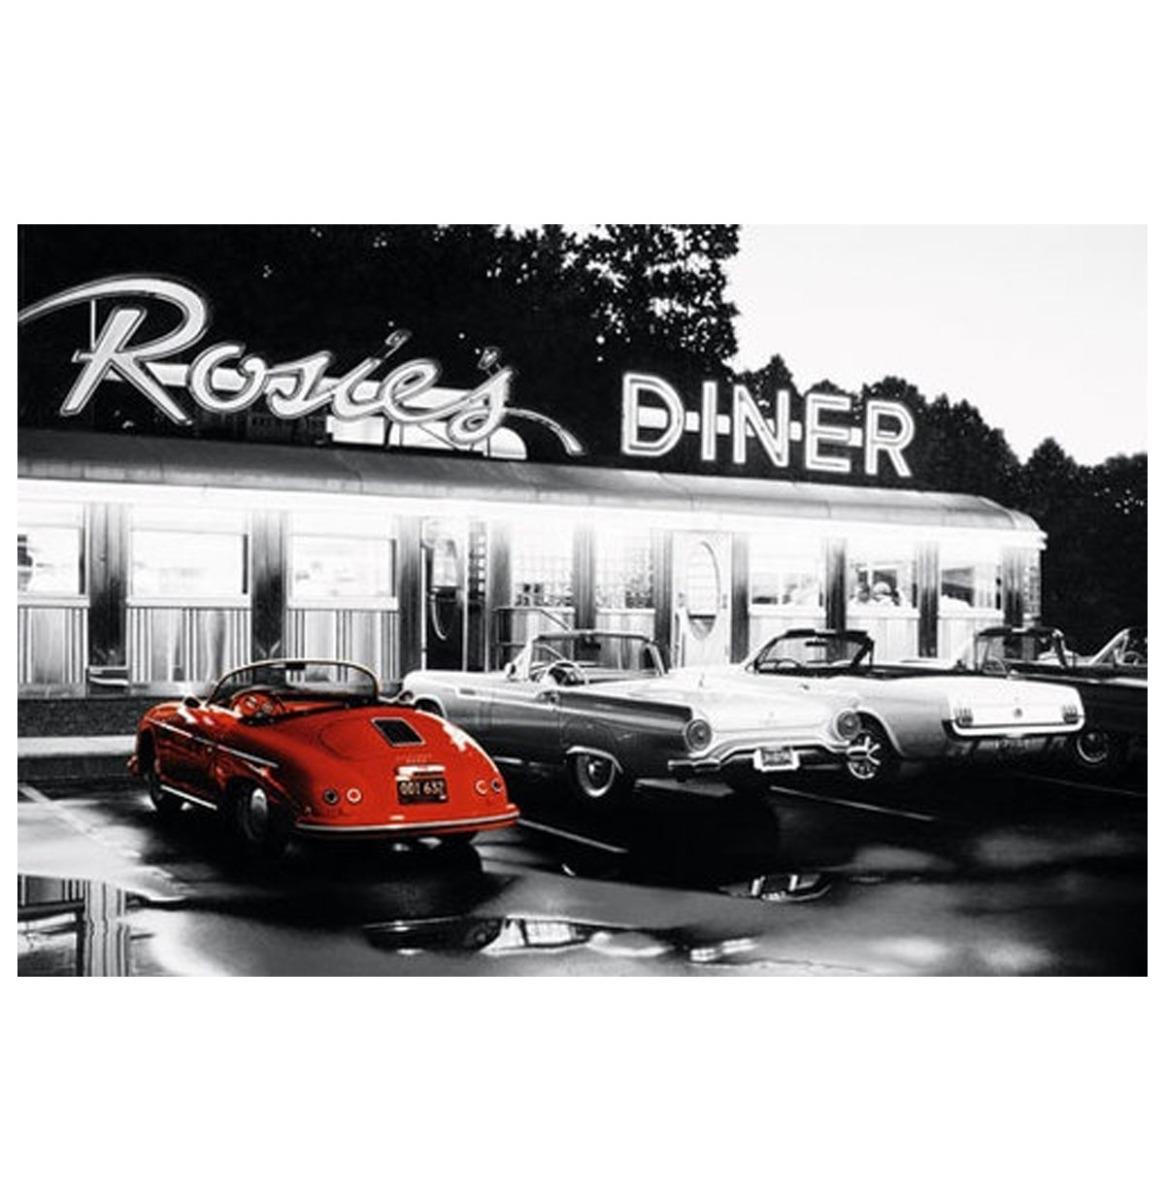 Rosie's Diner Black & White Metalen Bord - 8 x 11 cm